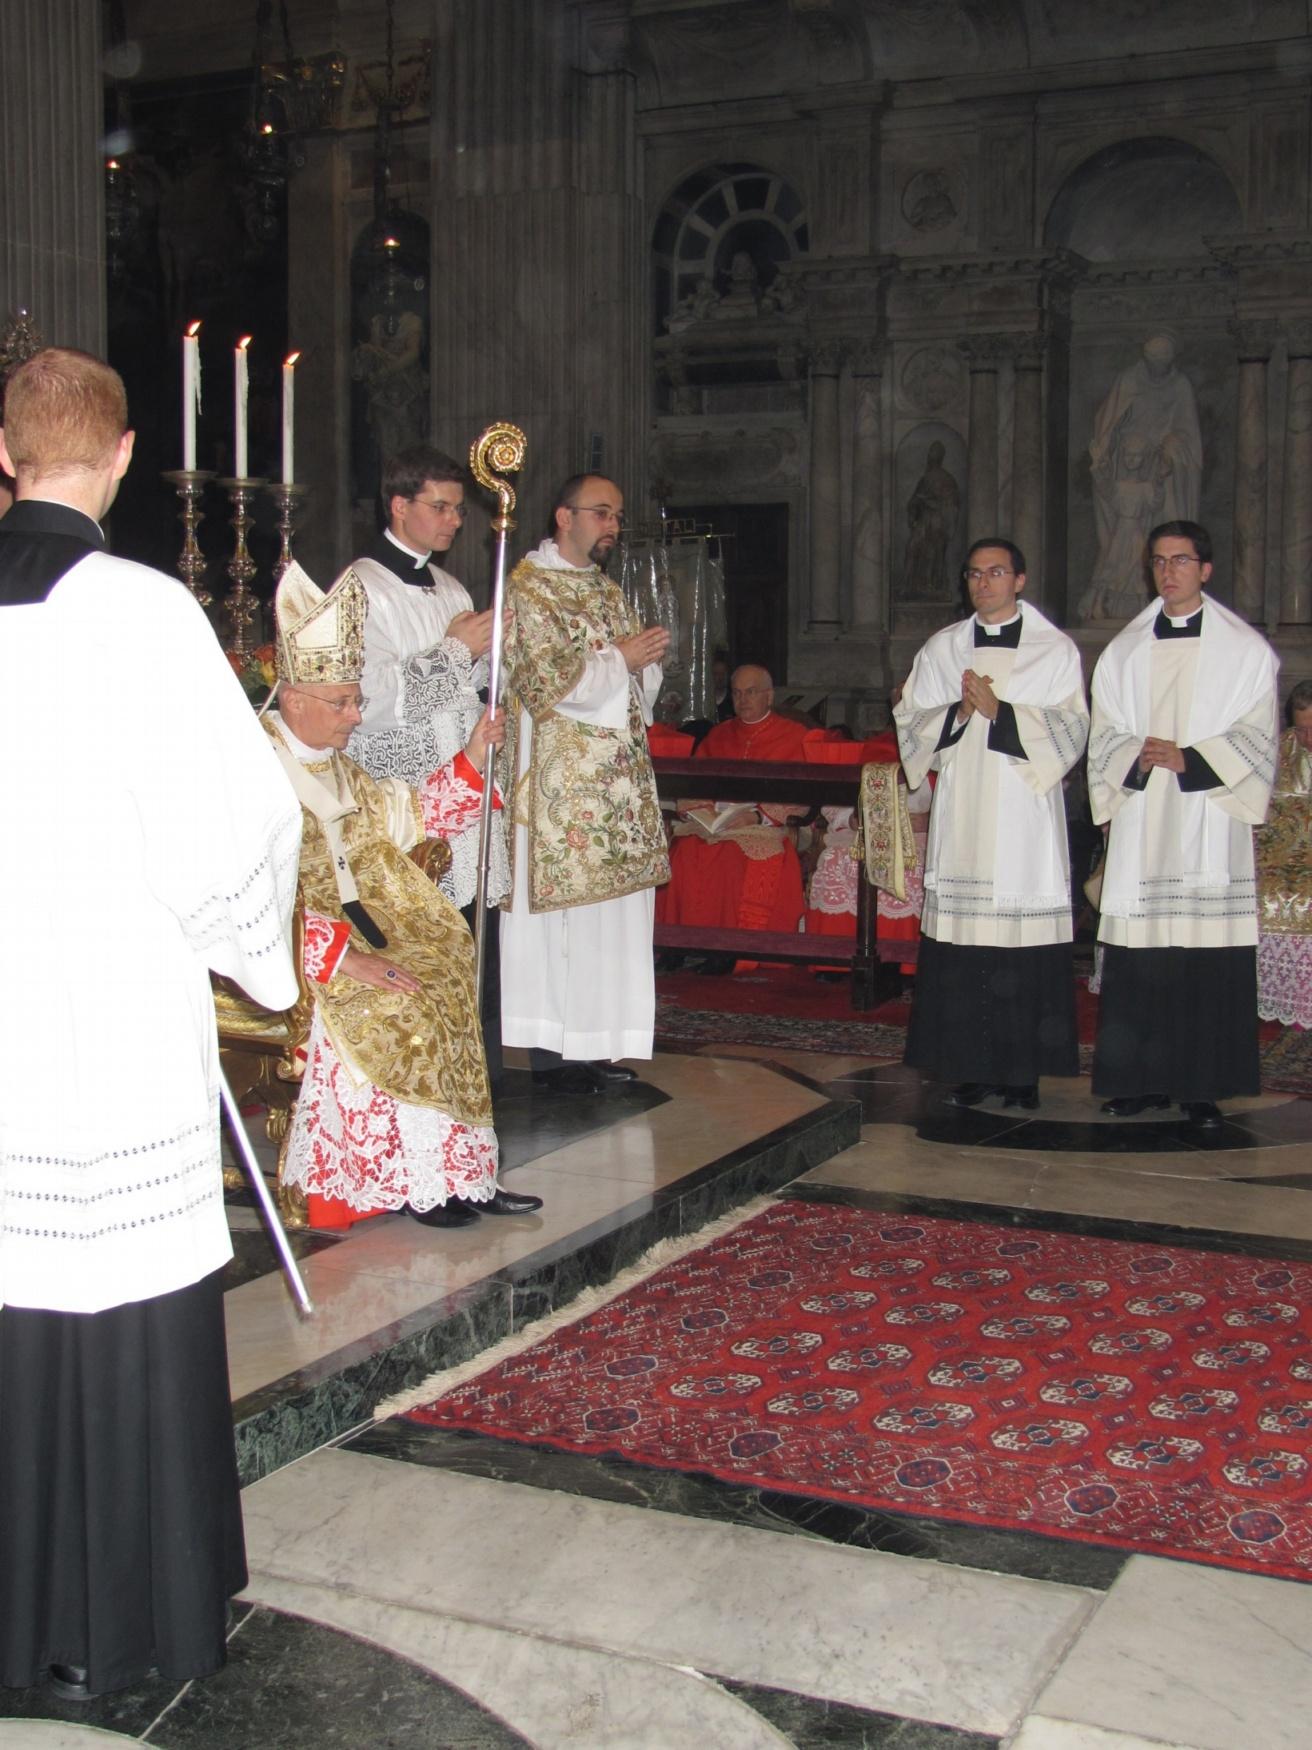 ordinazione_episcopale_gallese_2012-11-11-16-04-53